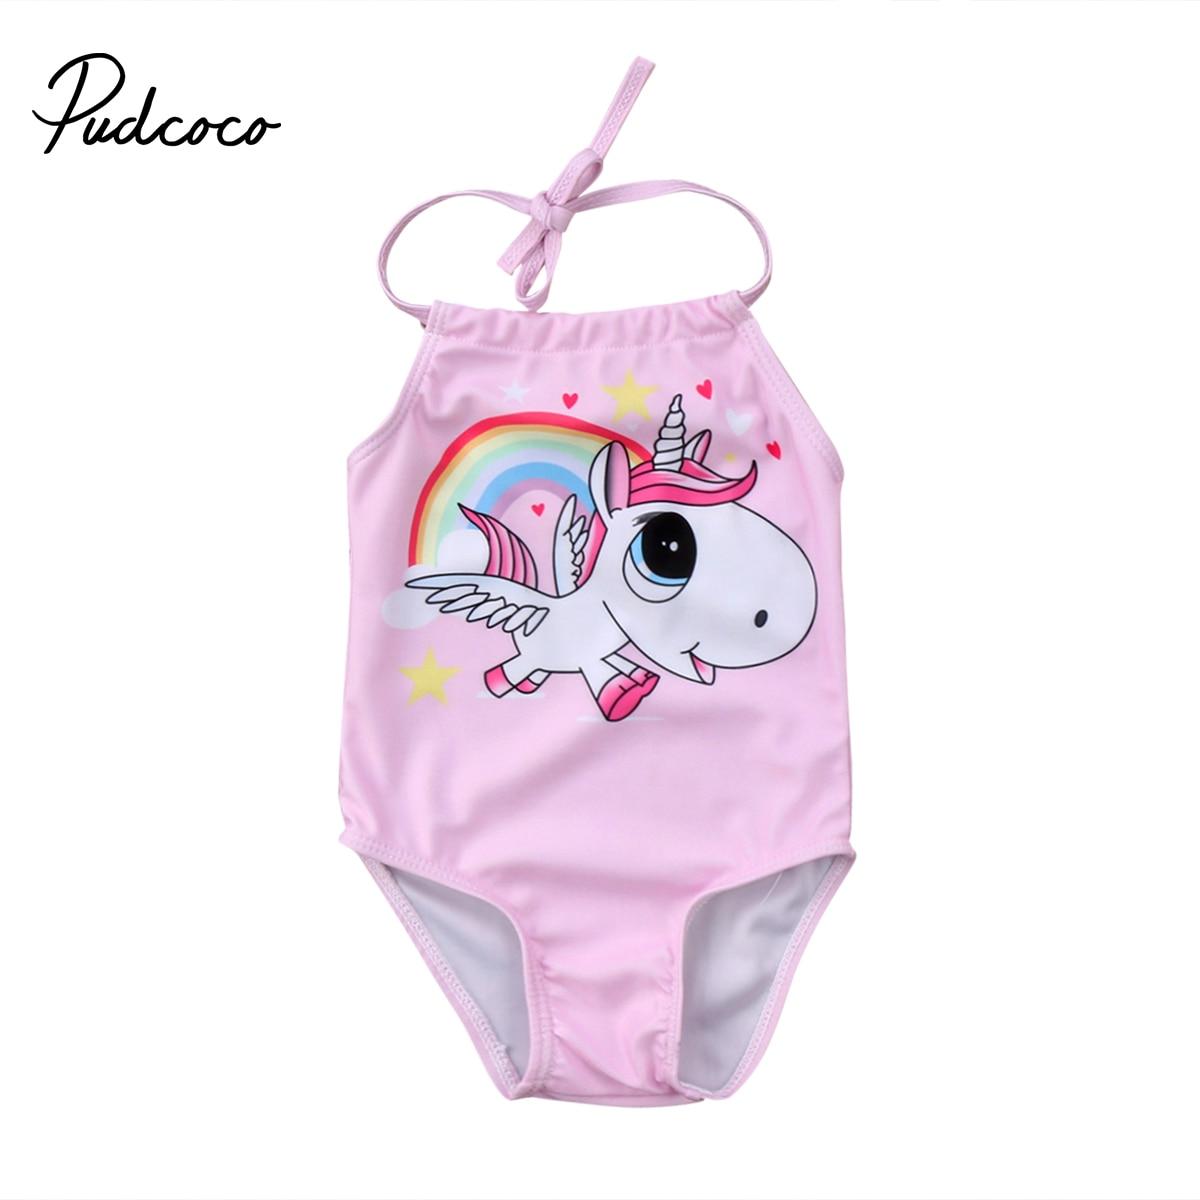 Pudcoco 0-24Months  Kid Baby Girls Cute Unicorn Bikini Swimwear Swimsuit Bathing Suit Beachwear